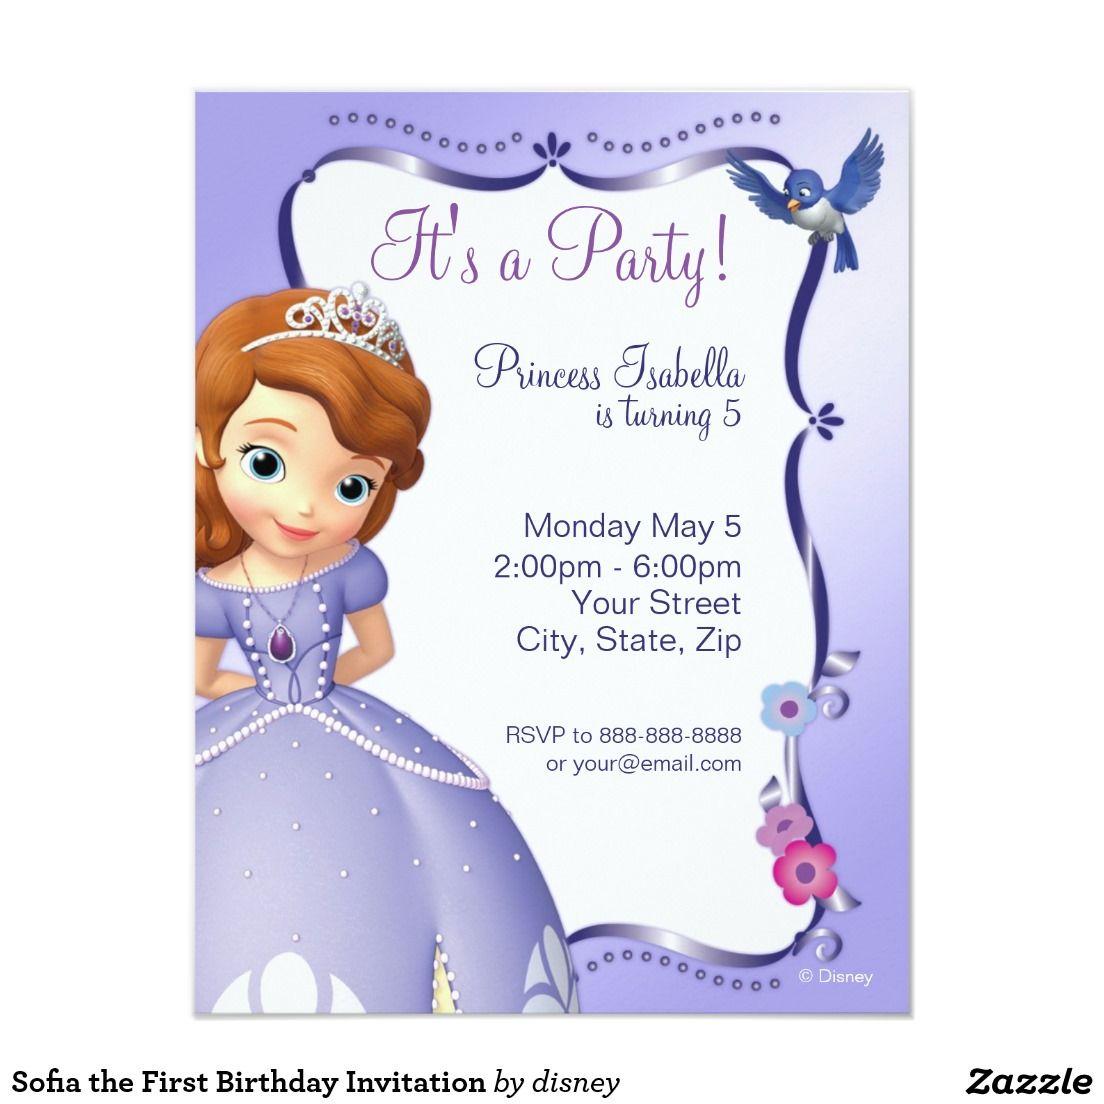 Sofia The First Birthday Invitation Zazzle Com First Birthday Invitations Sofia The First Birthday Party Birthday Invitations